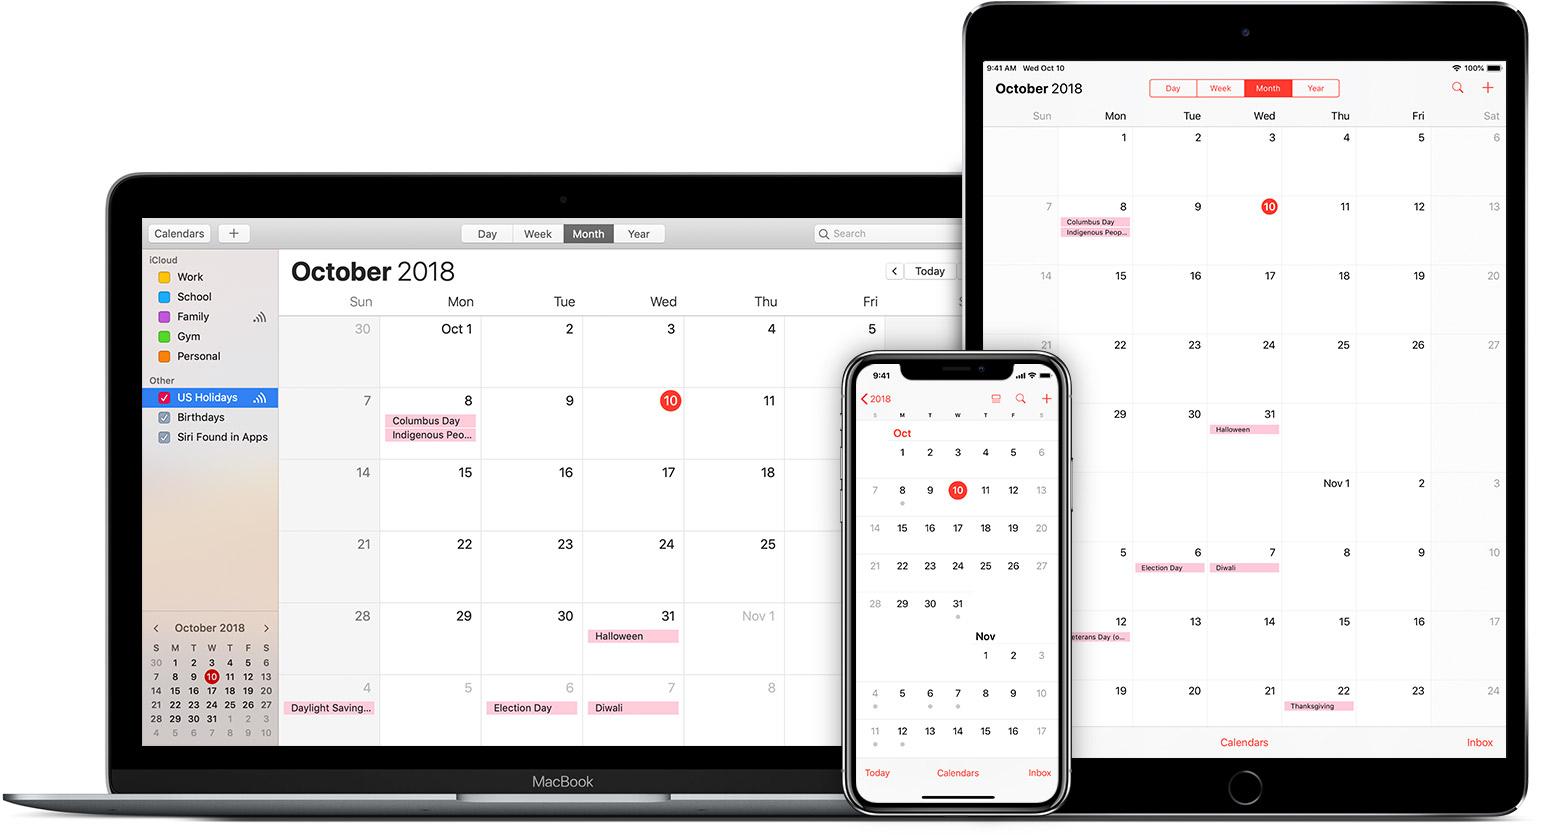 Mac, iPad, and iPhone showing iCloud calendar